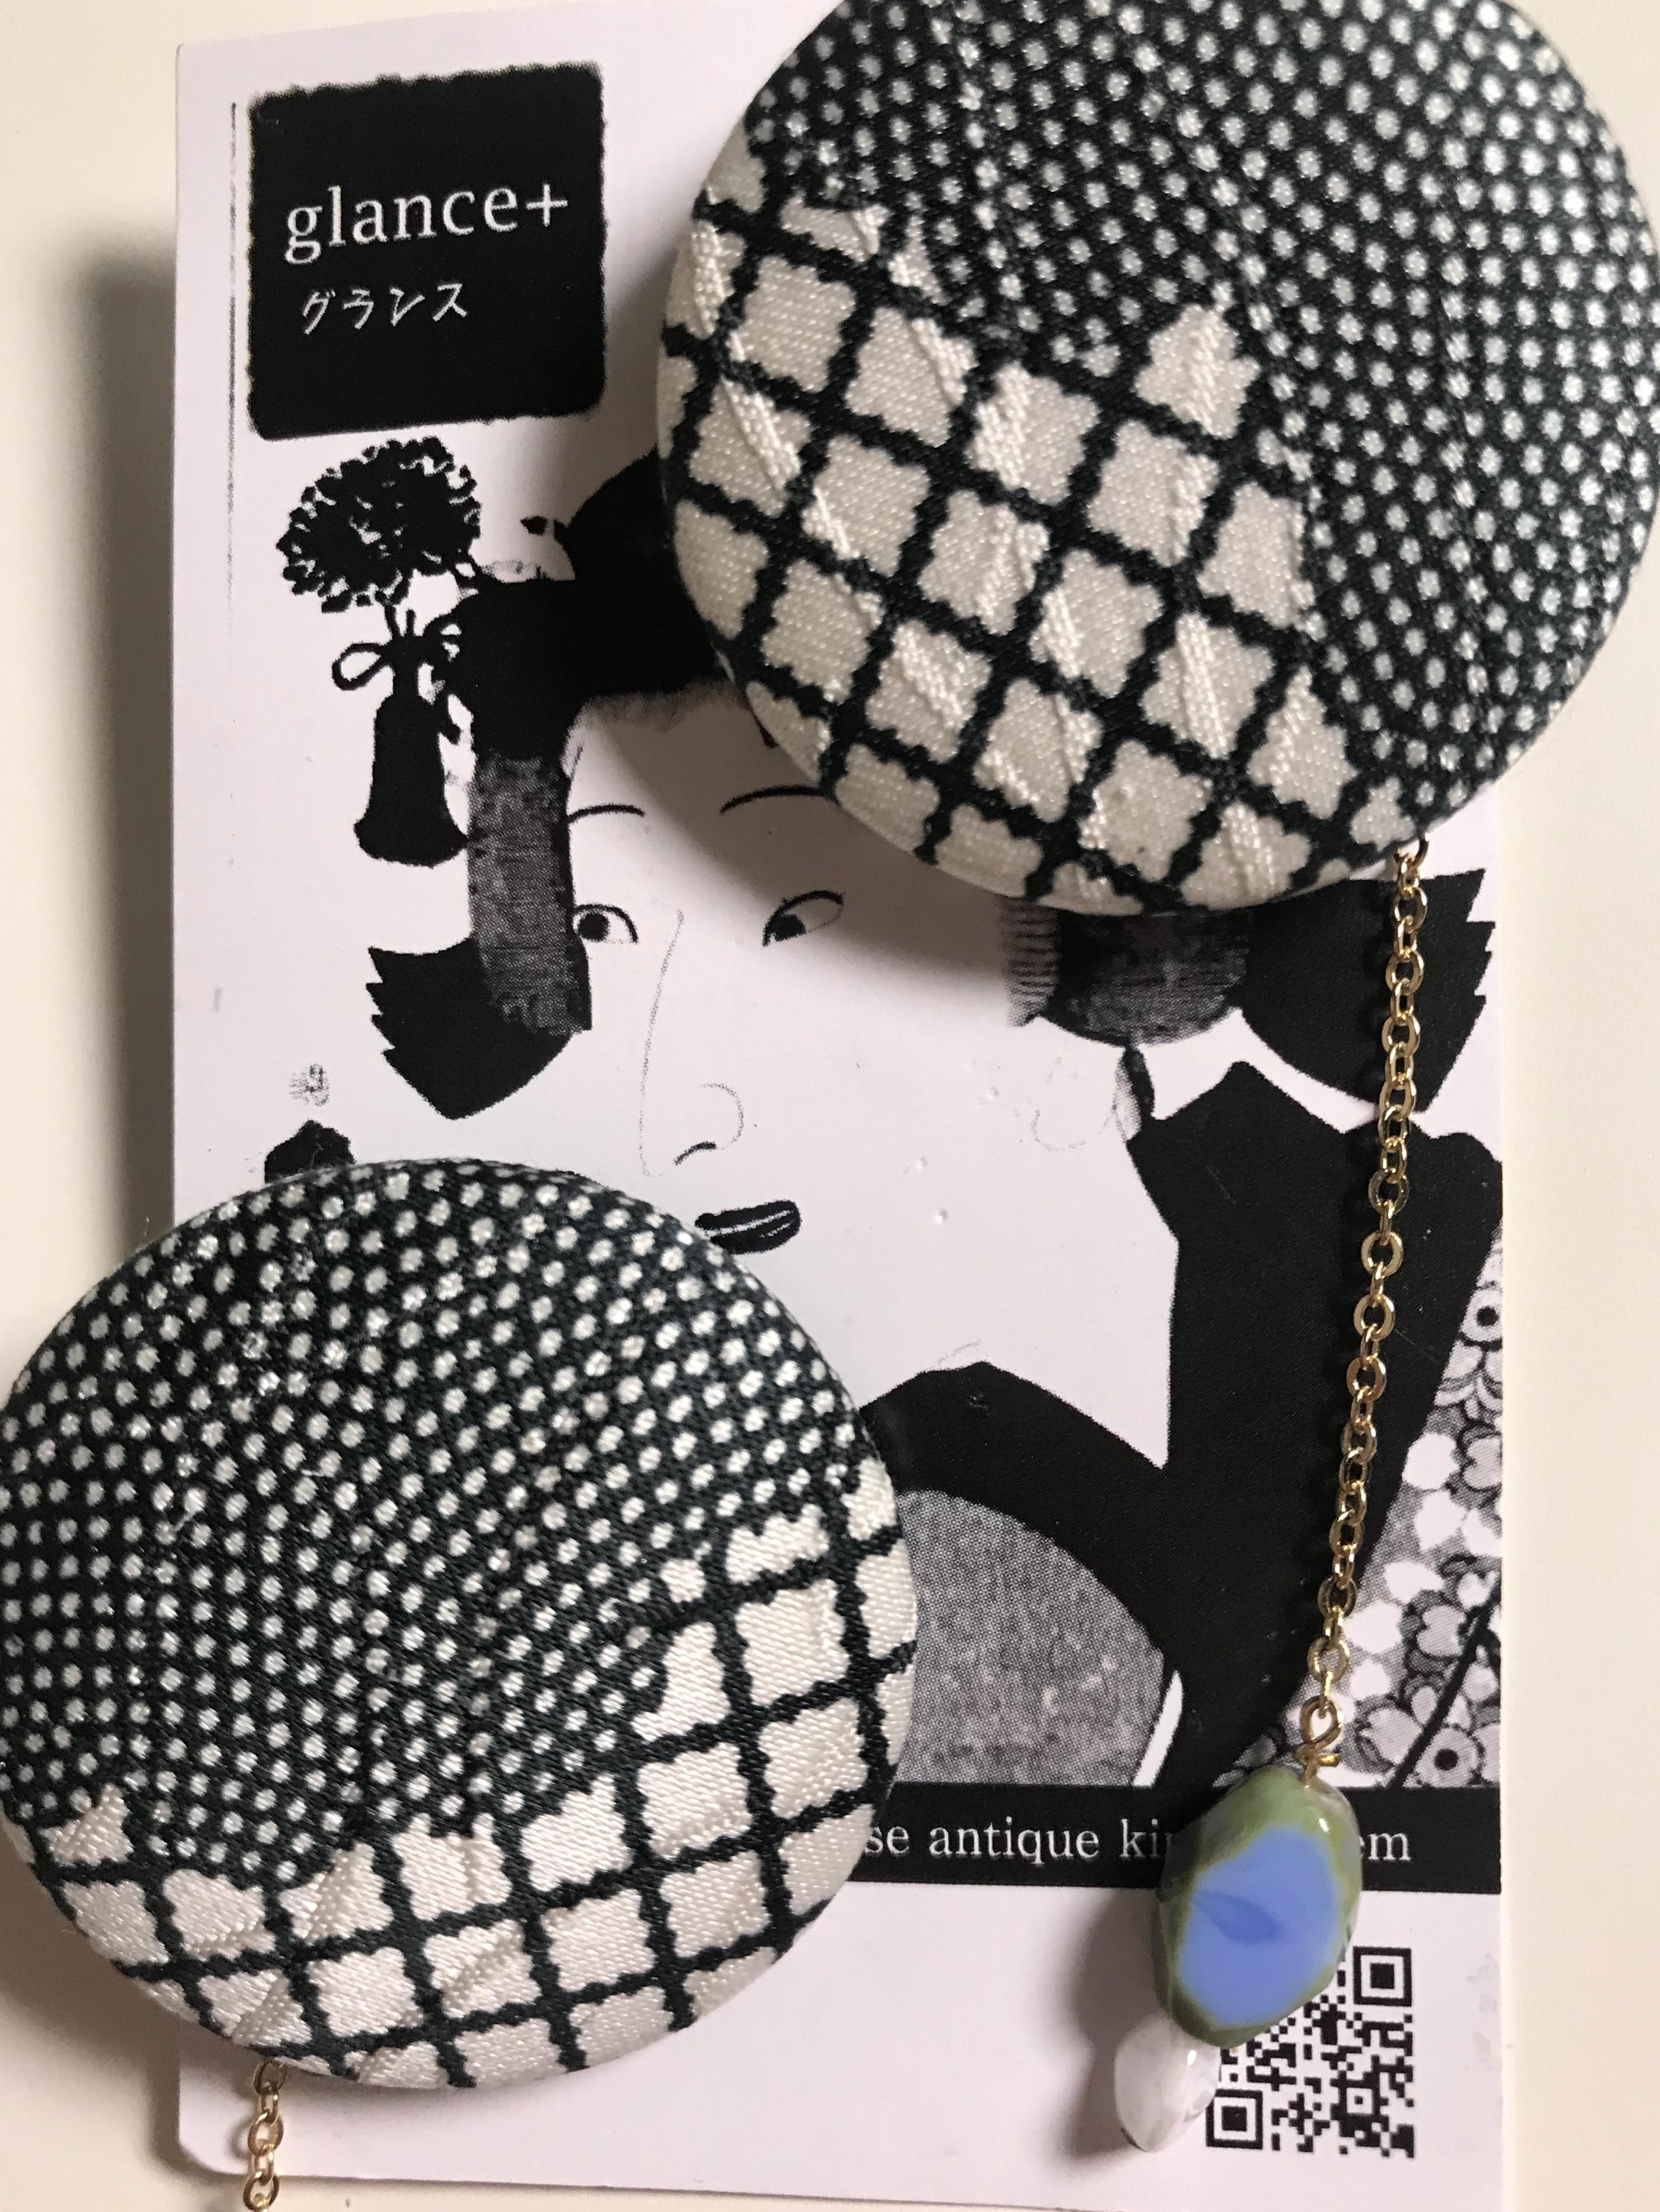 glance +  着物ピアス(アンテーク着物・市松模様)-18